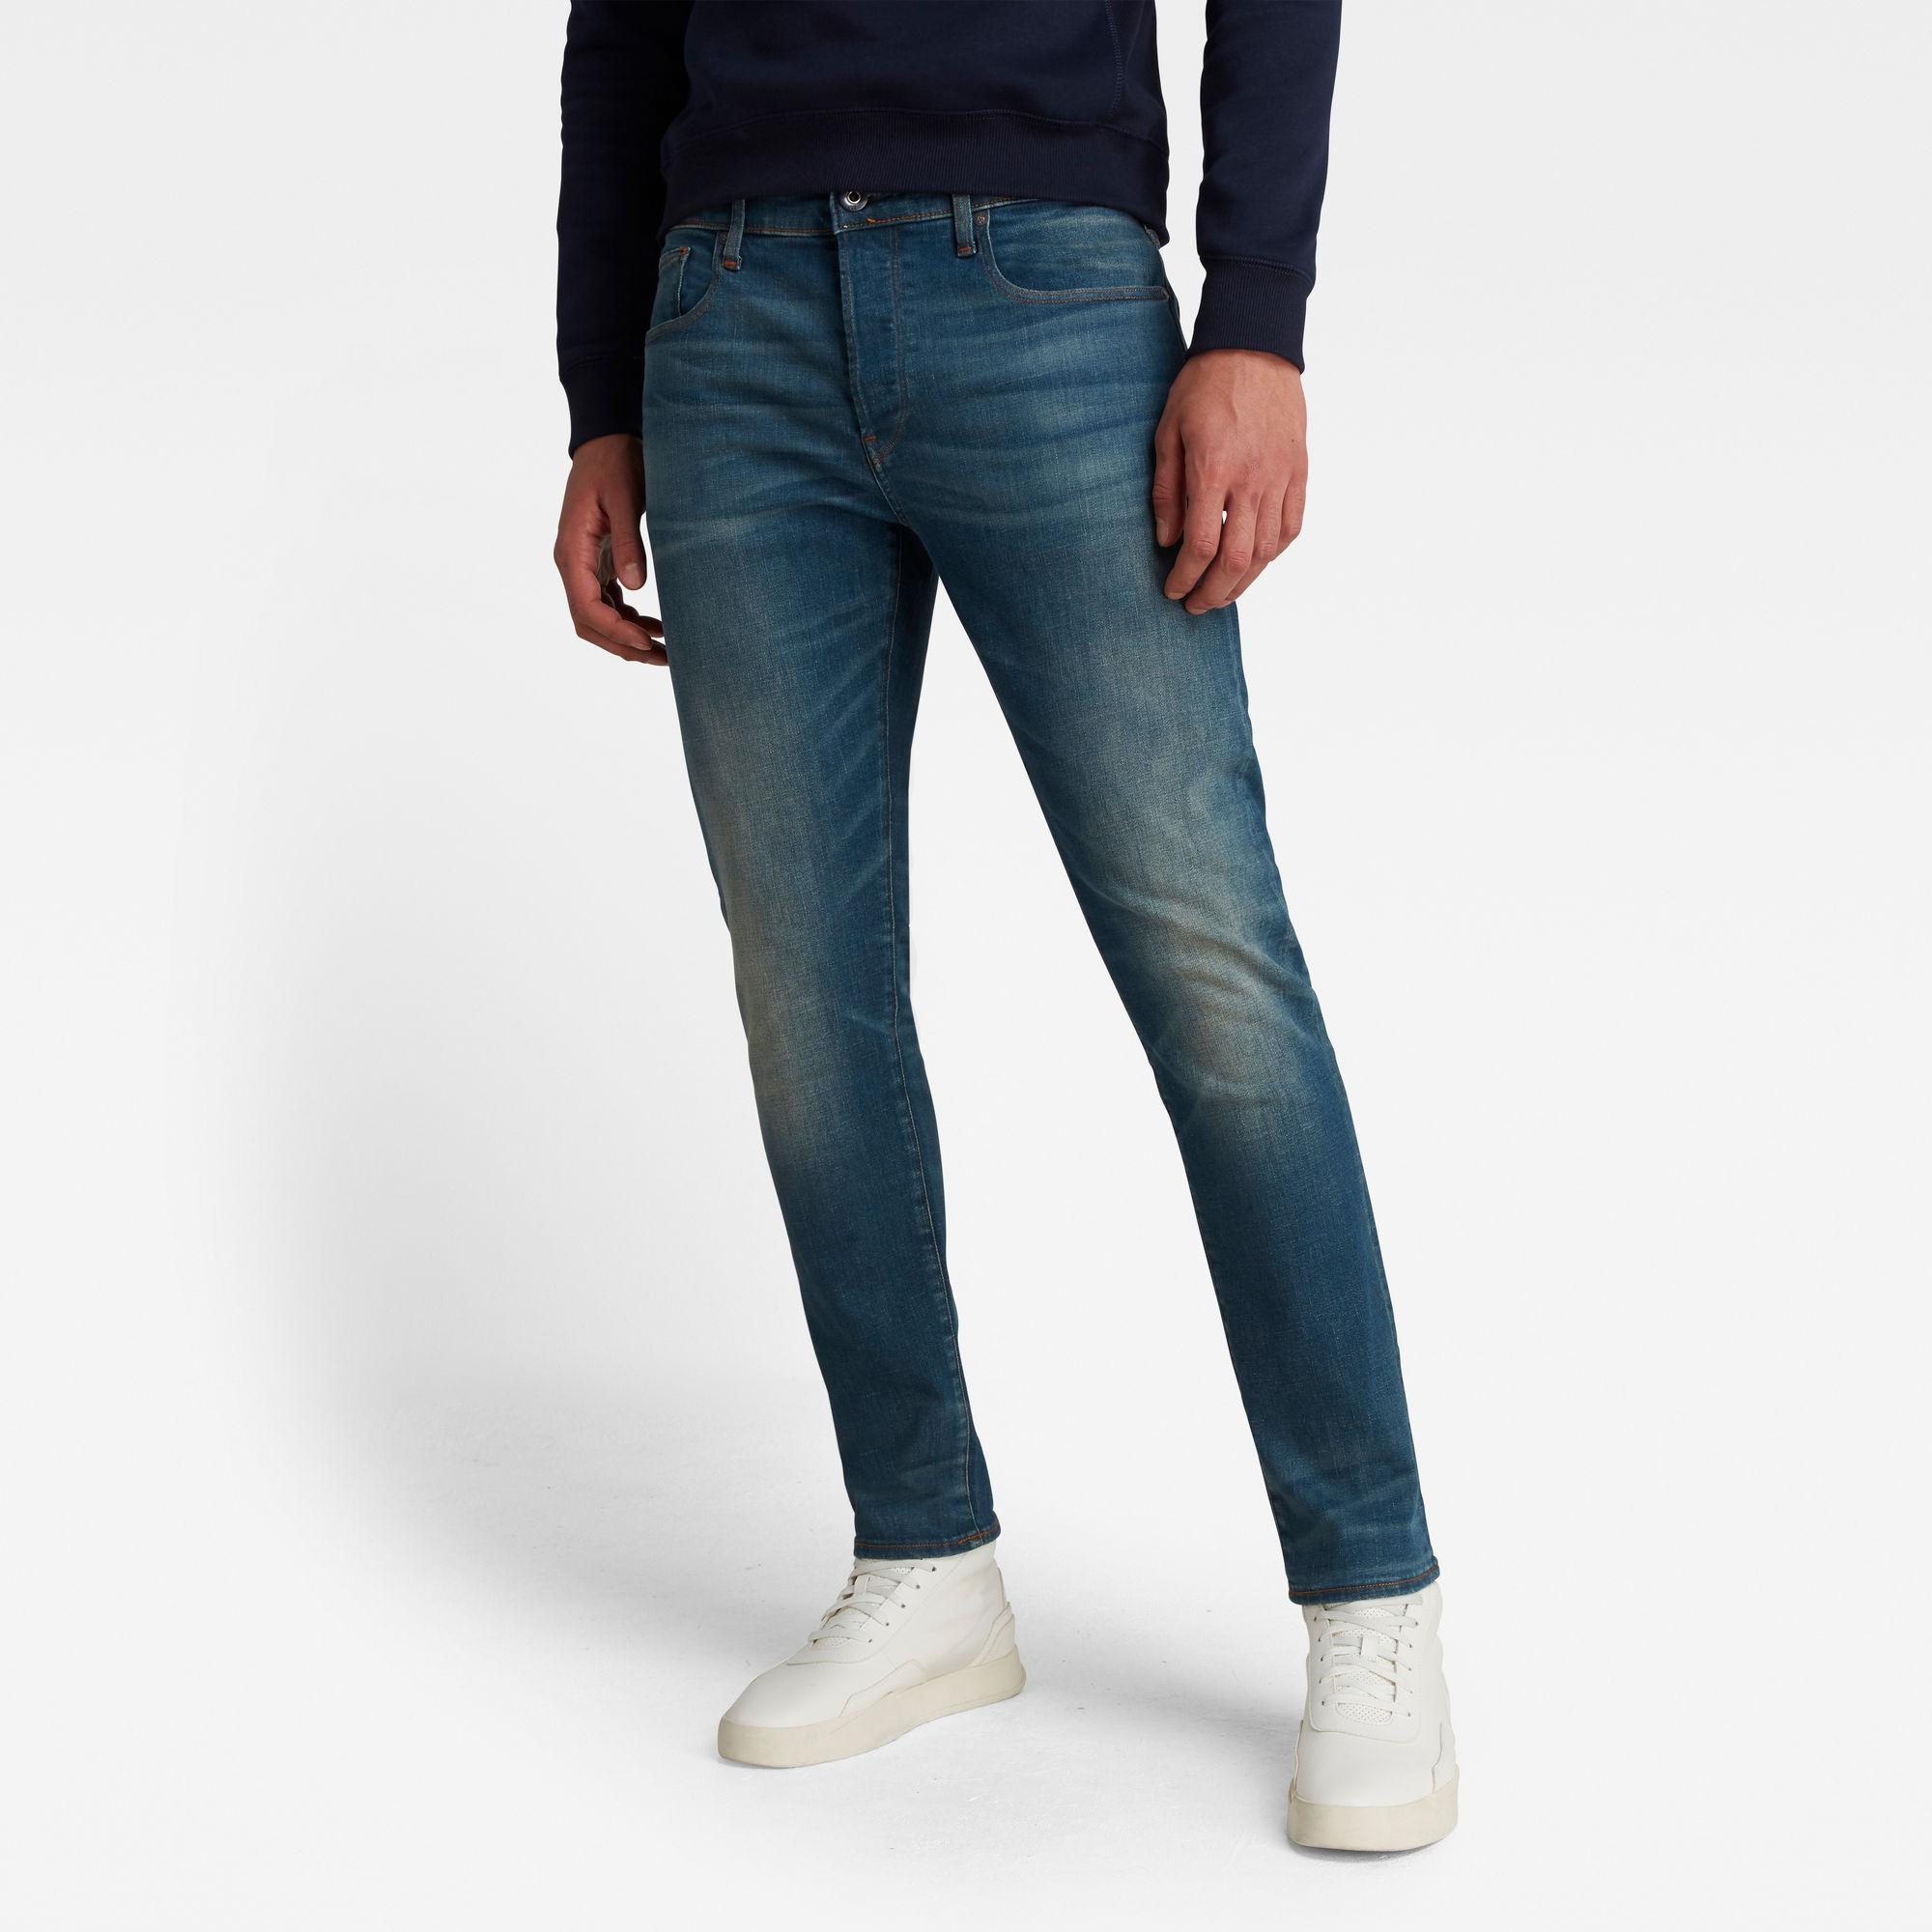 G-Star RAW Heren 3301 Slim Jeans Blauw